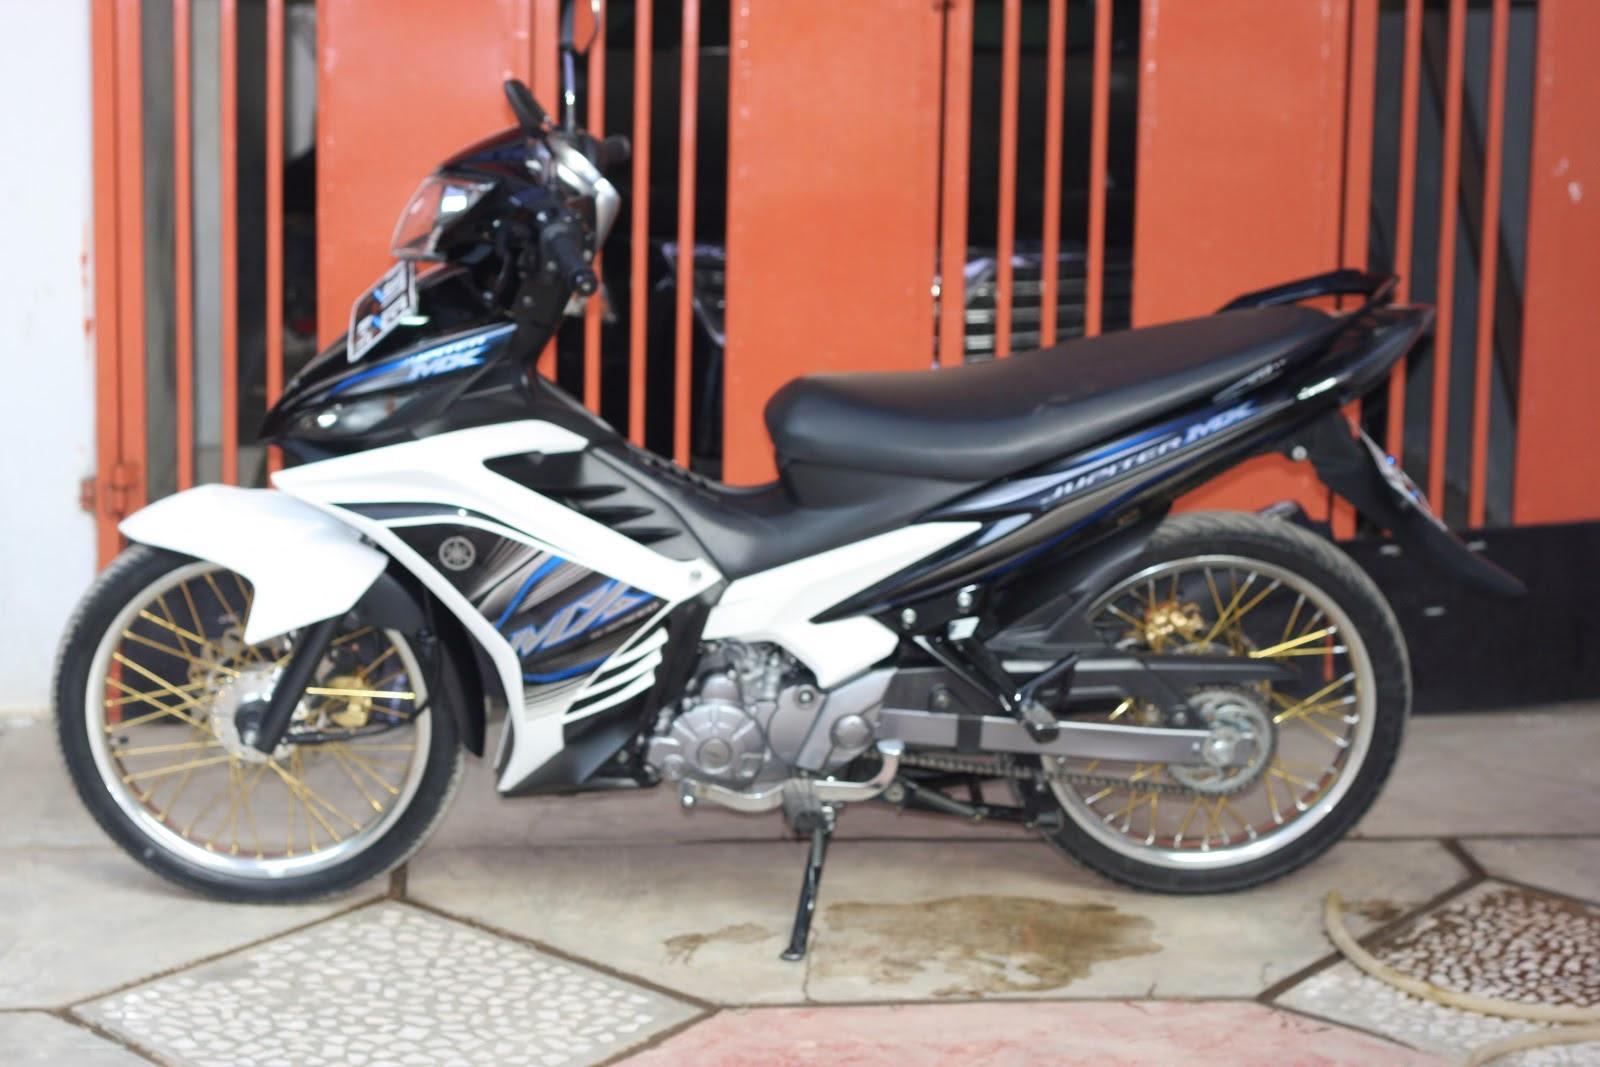 Modifikasi Motor Jupiter MX New 135 CC Terbaru Sukaon